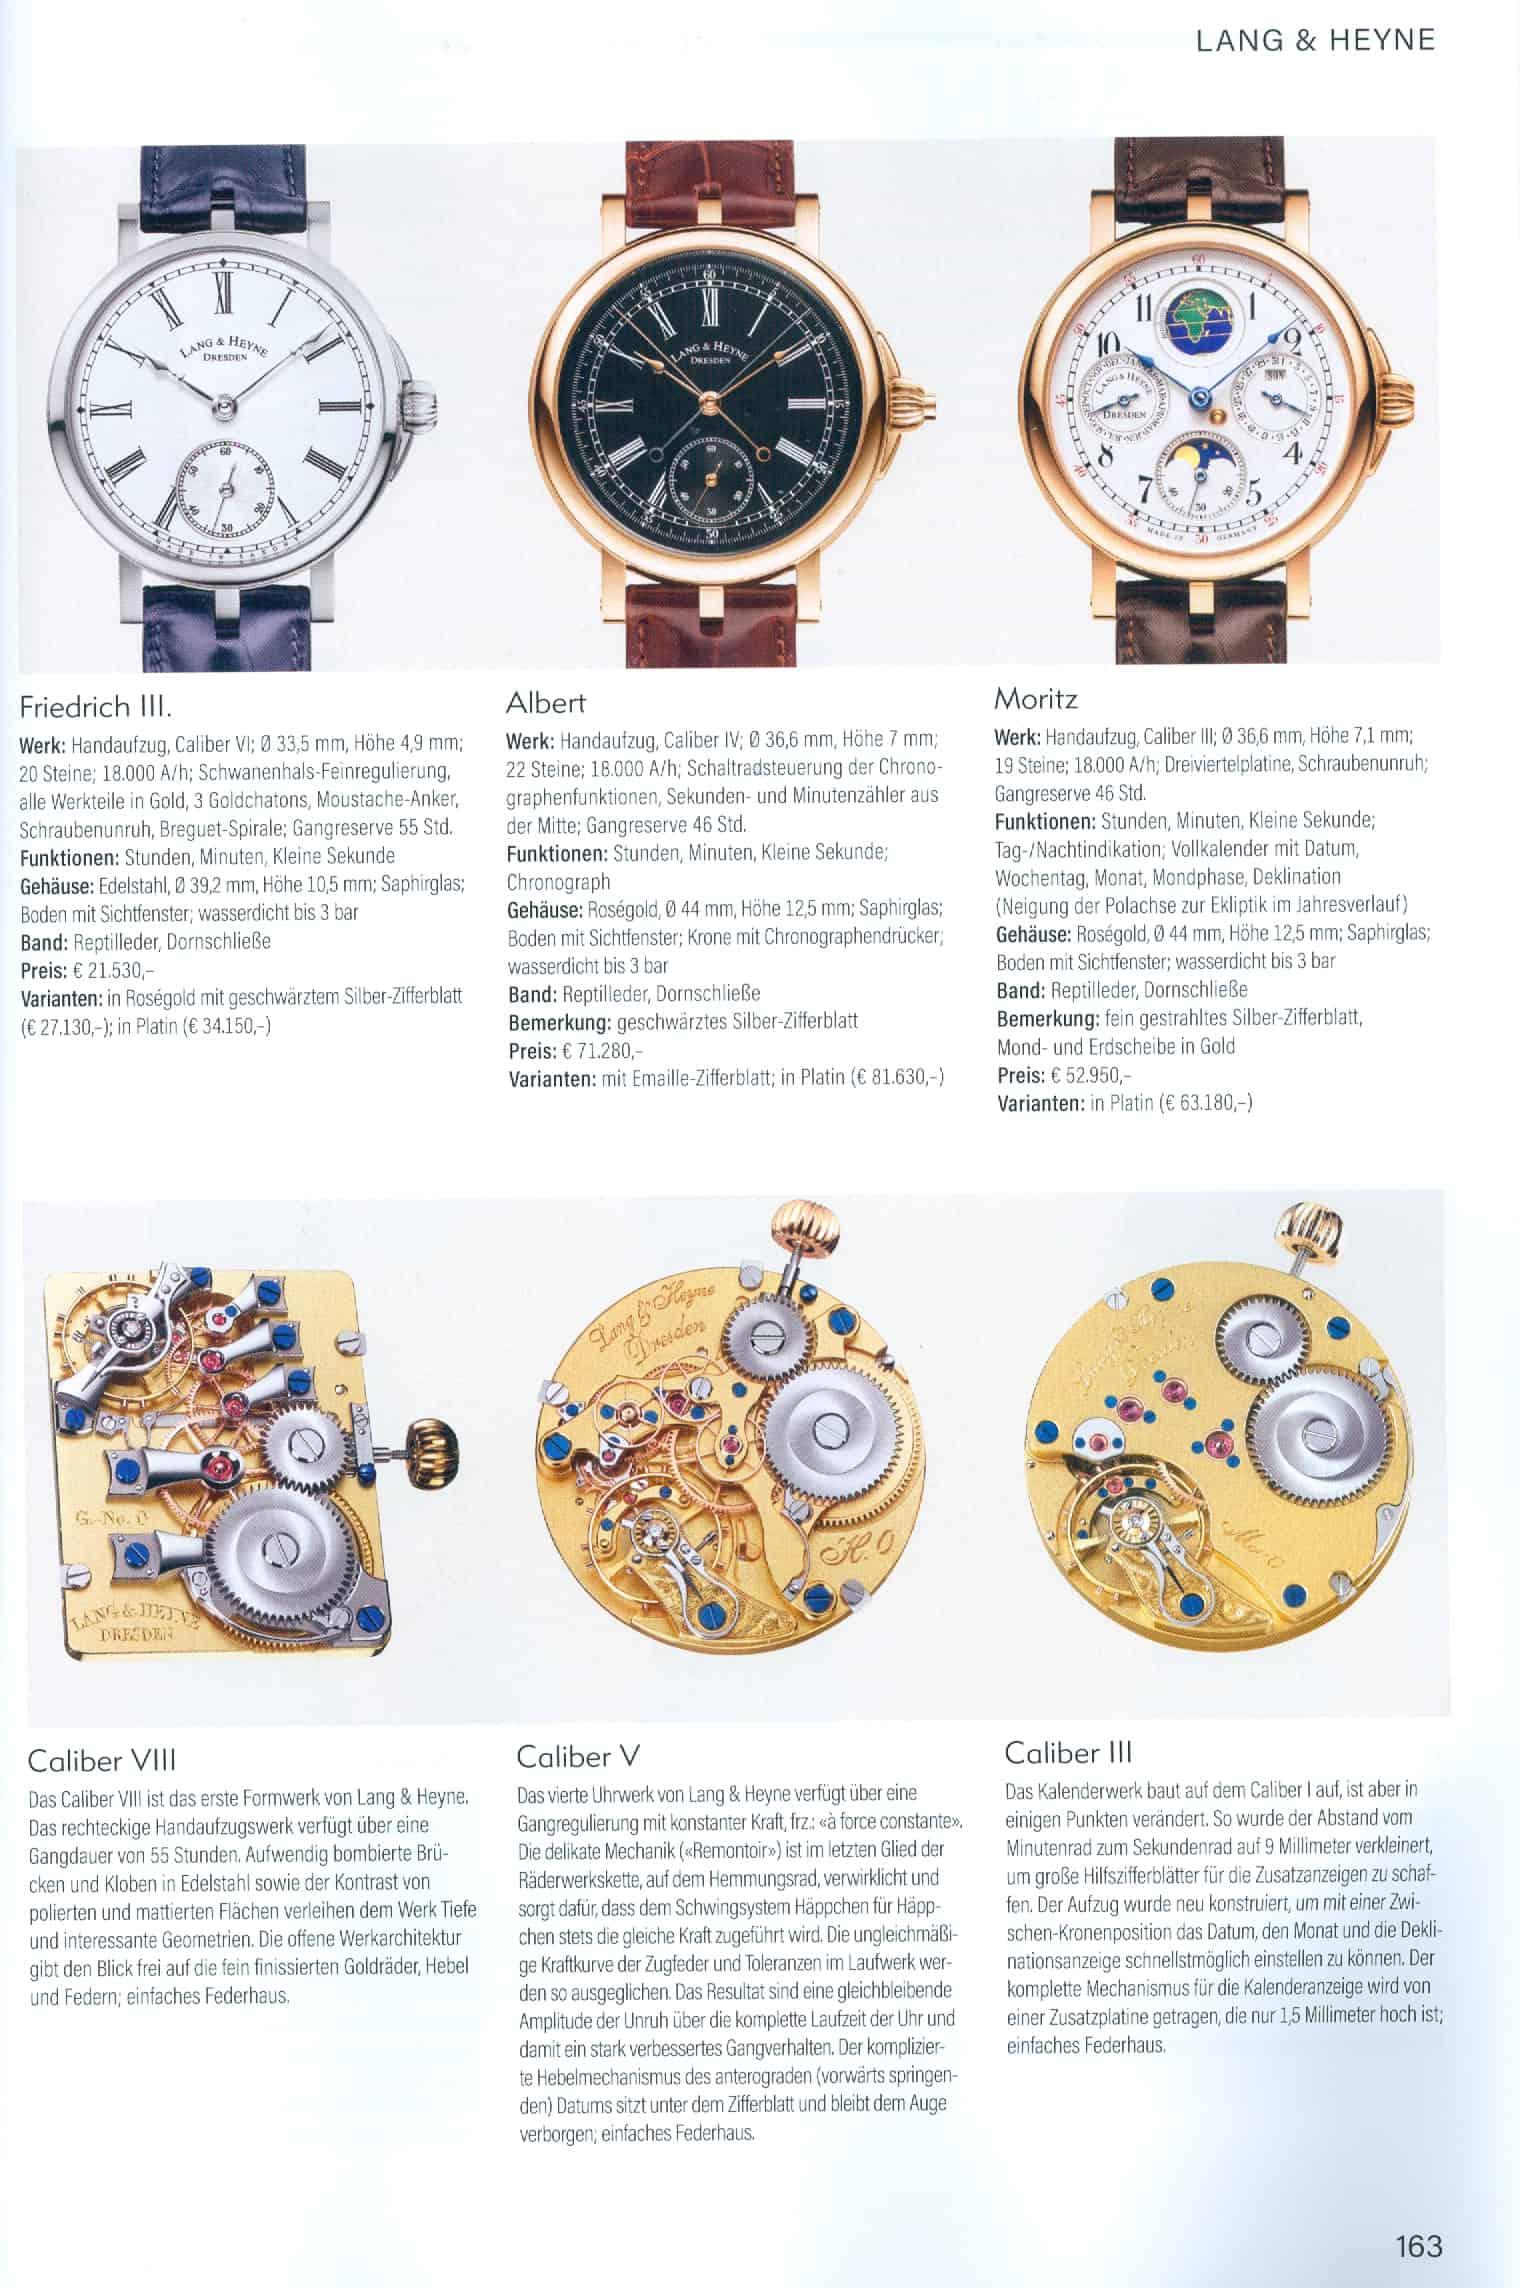 Armbanduhren Katalog Heel Verlag 2020 2021 Lang Heyne